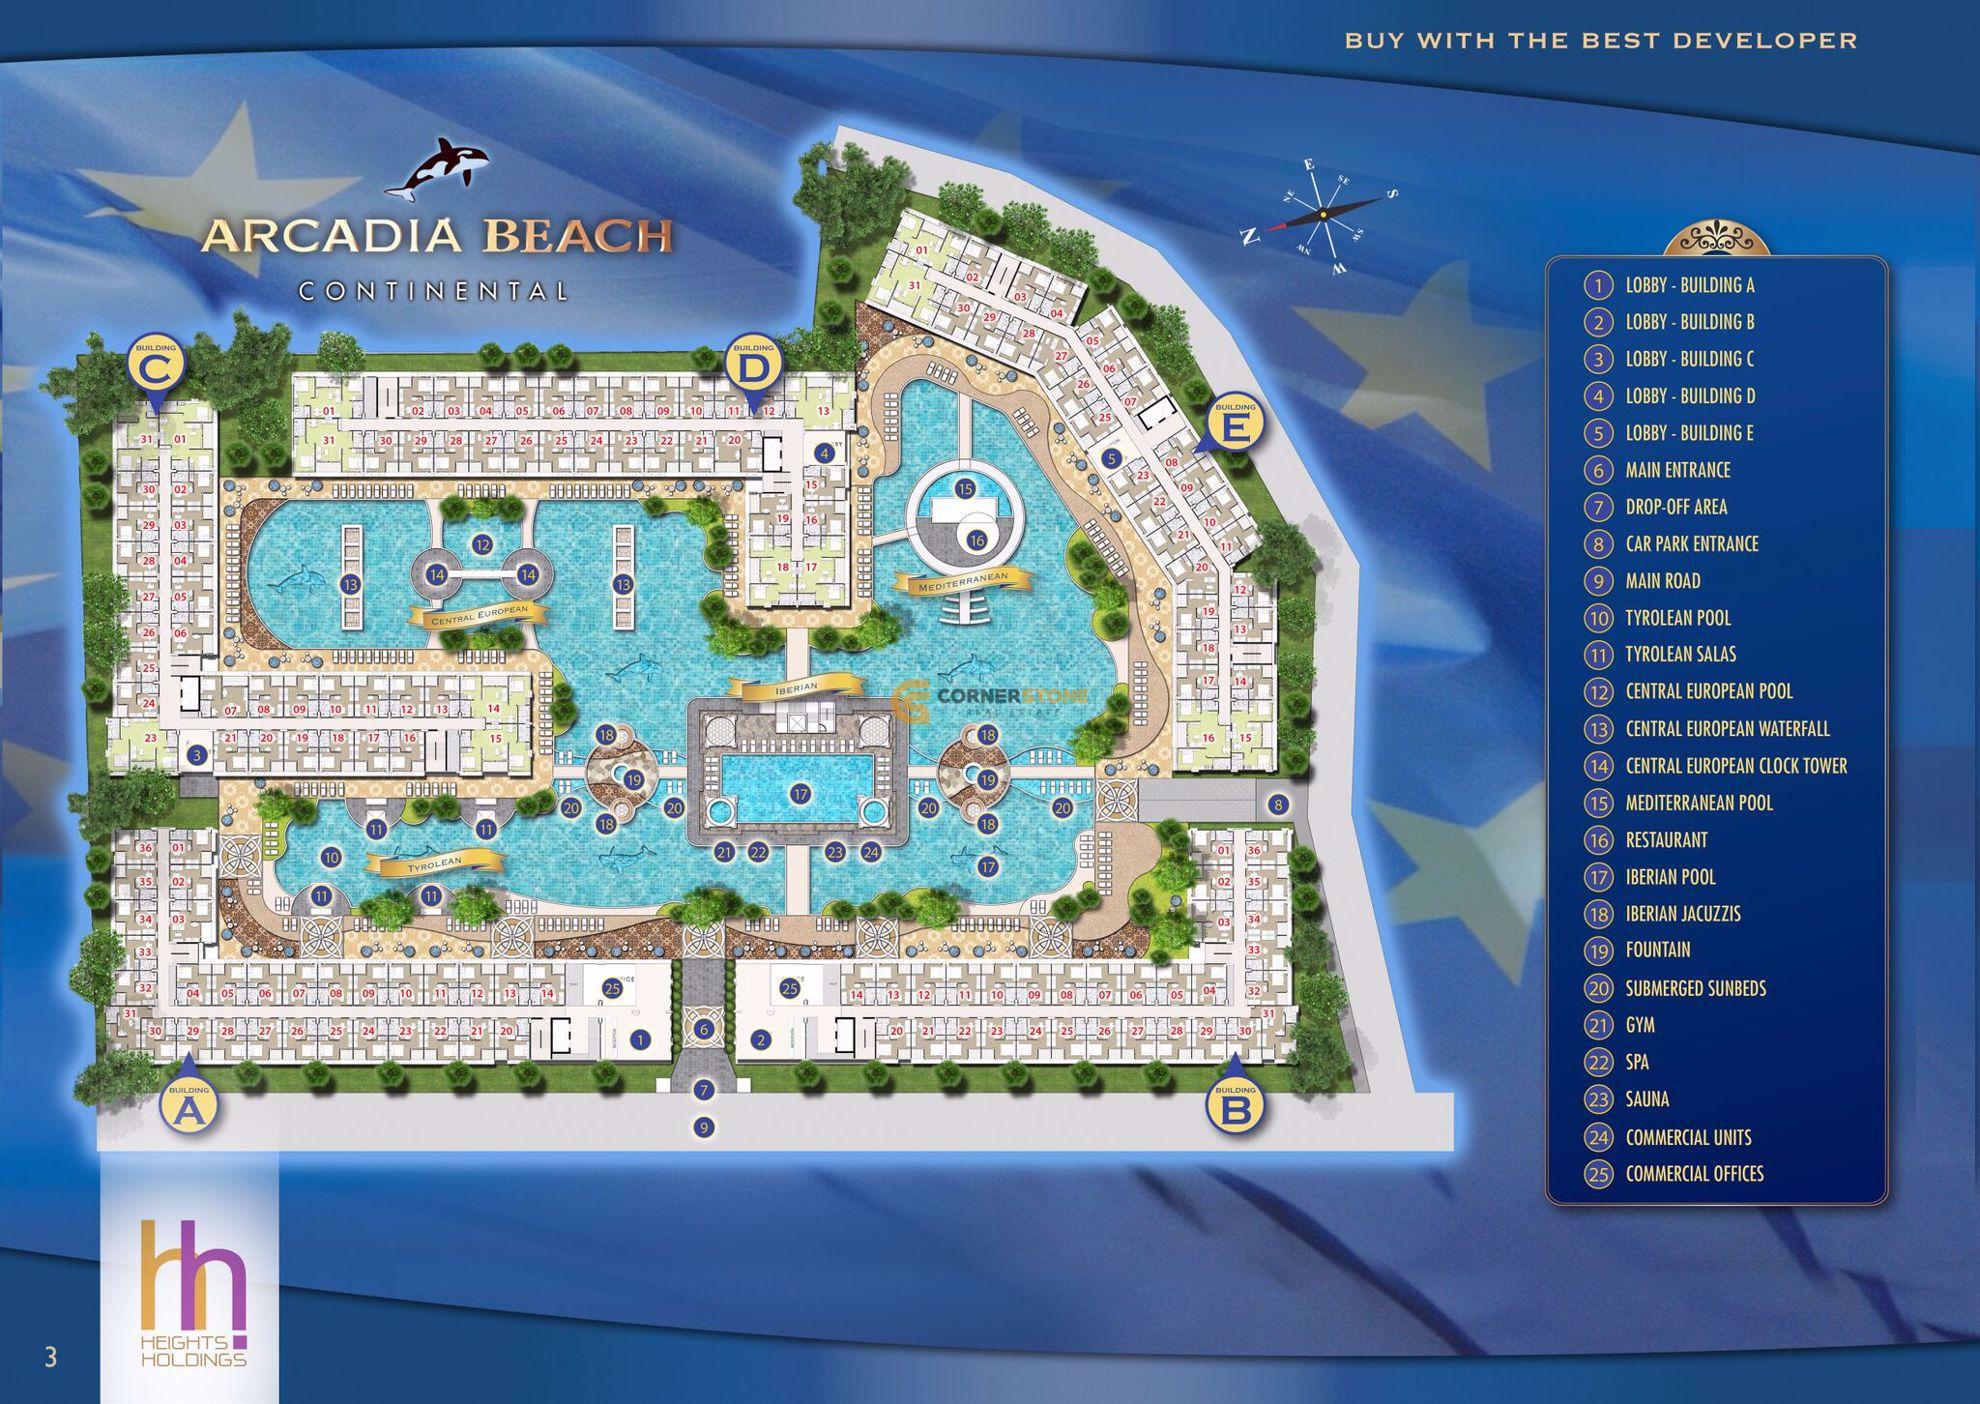 Arcadia Beach Continental